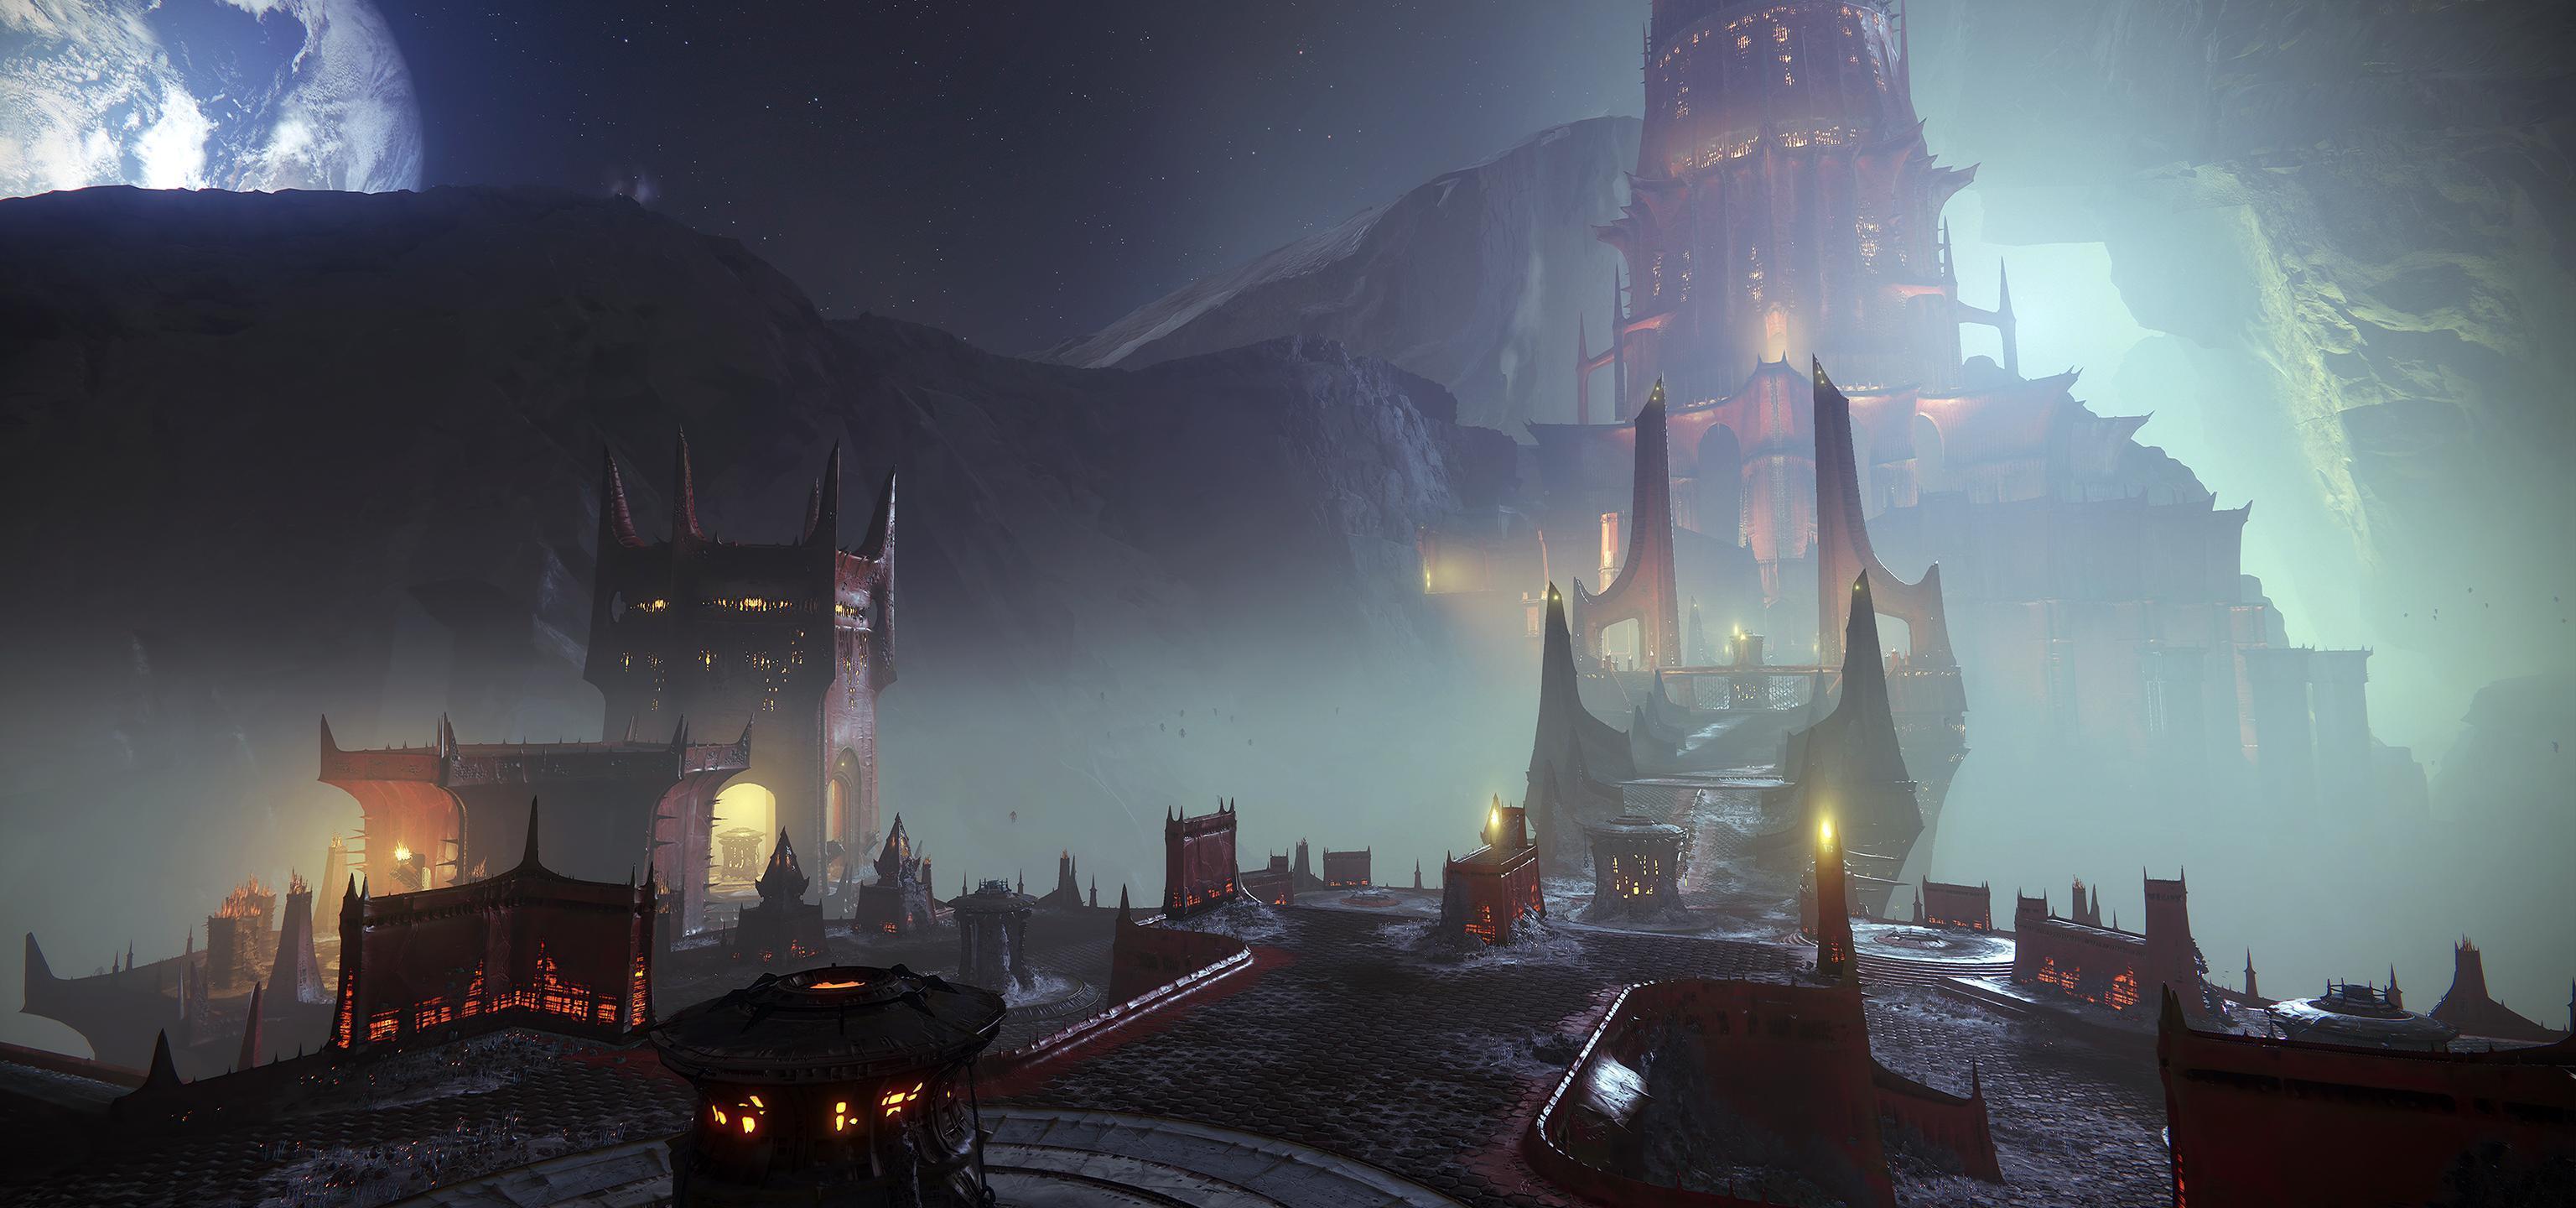 Destiny 2 Shadowkeep Wallpapers Top Free Destiny 2 Shadowkeep